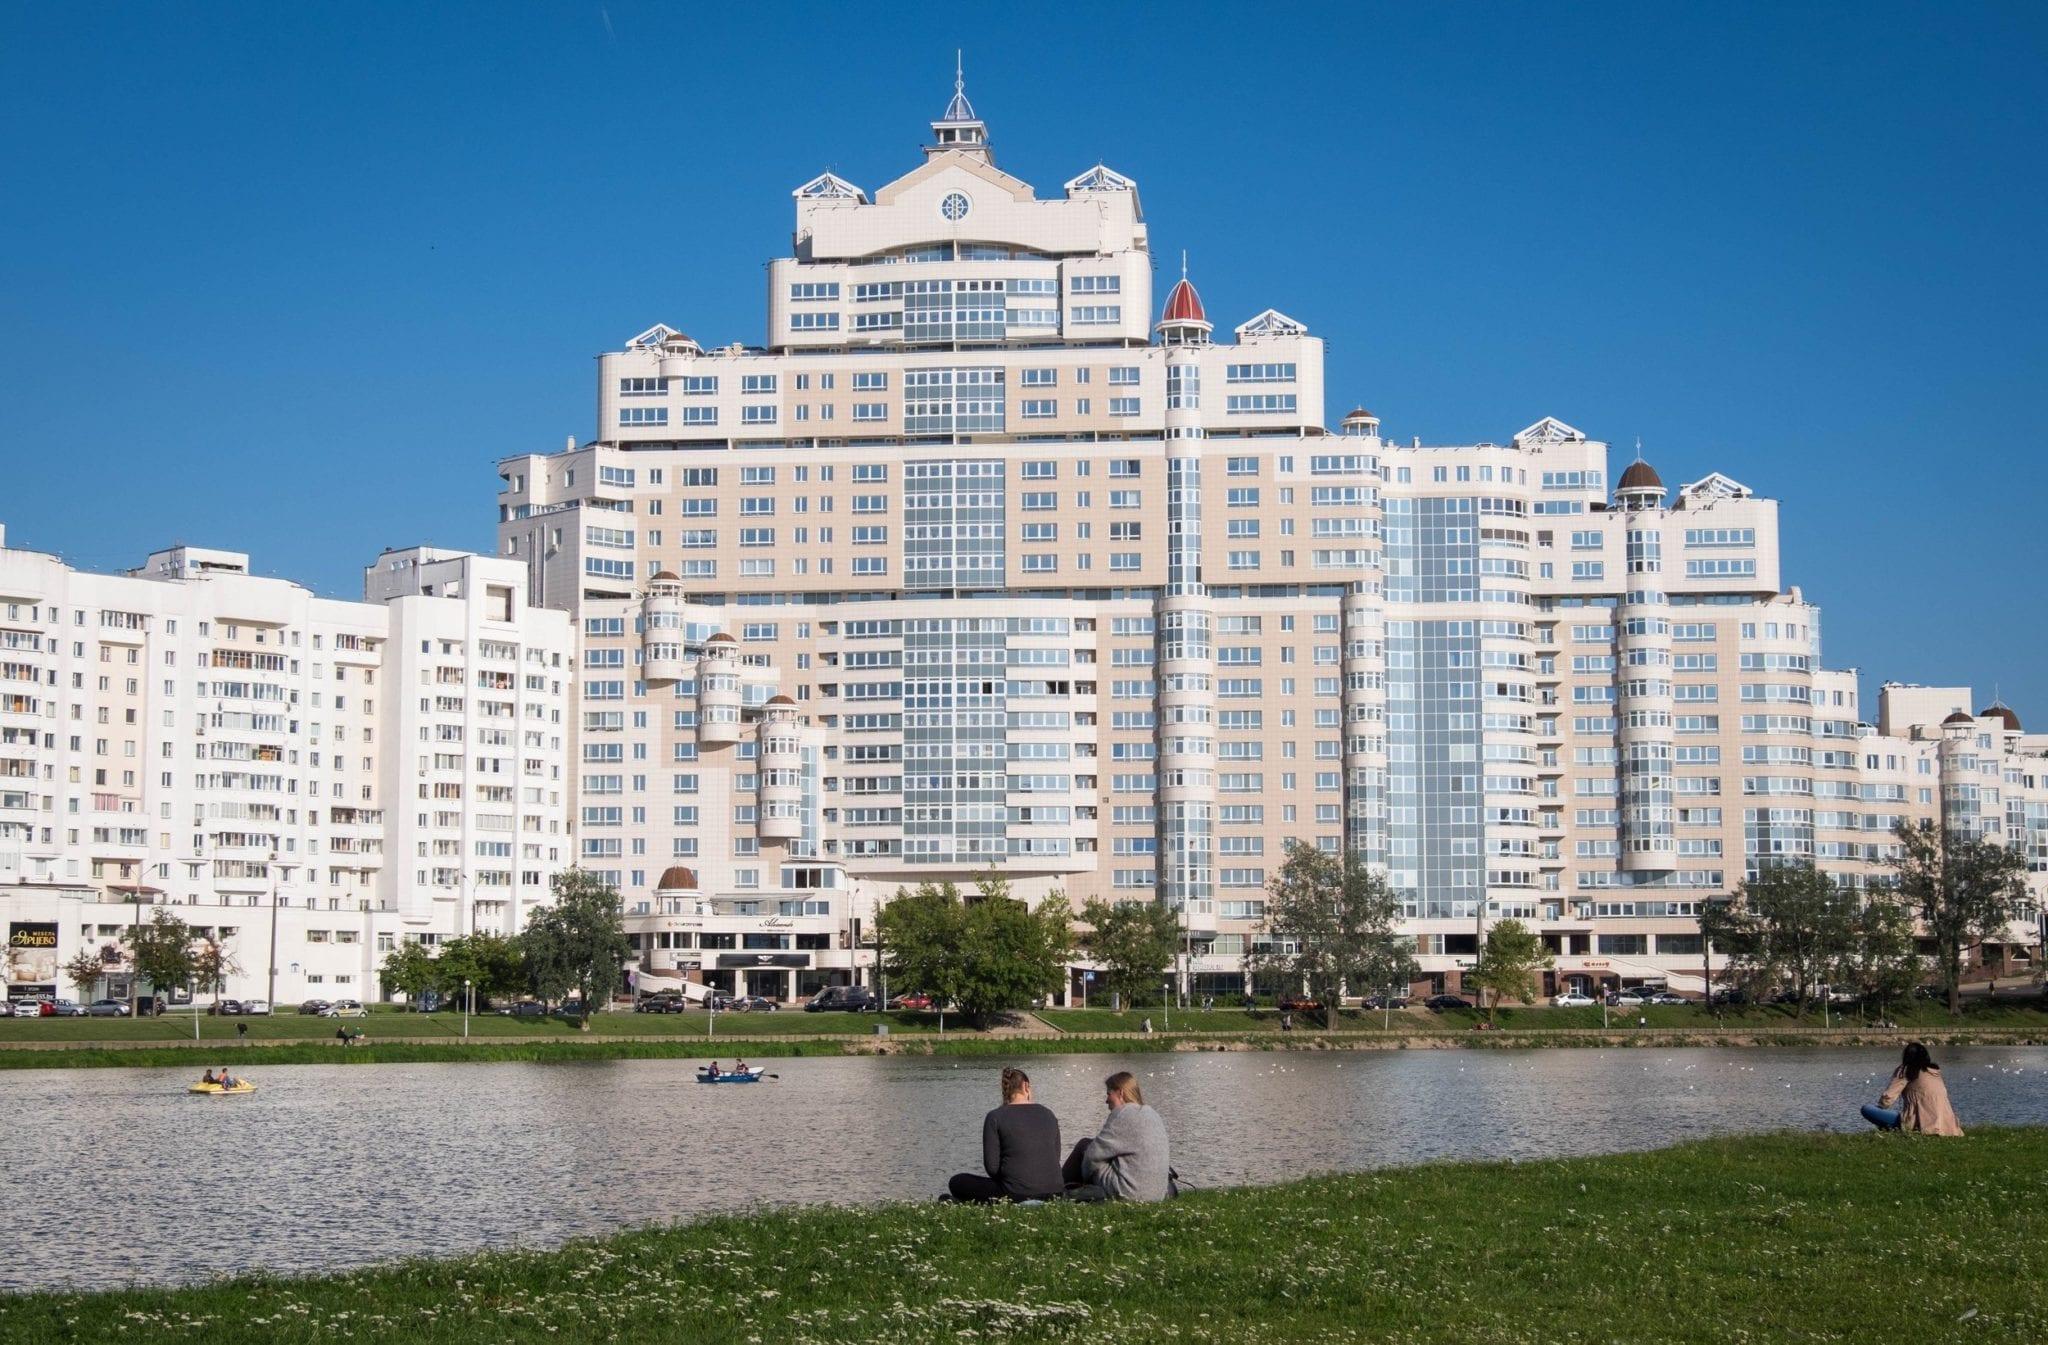 Chisinau And Minsk Two Offbeat Soviet Cities